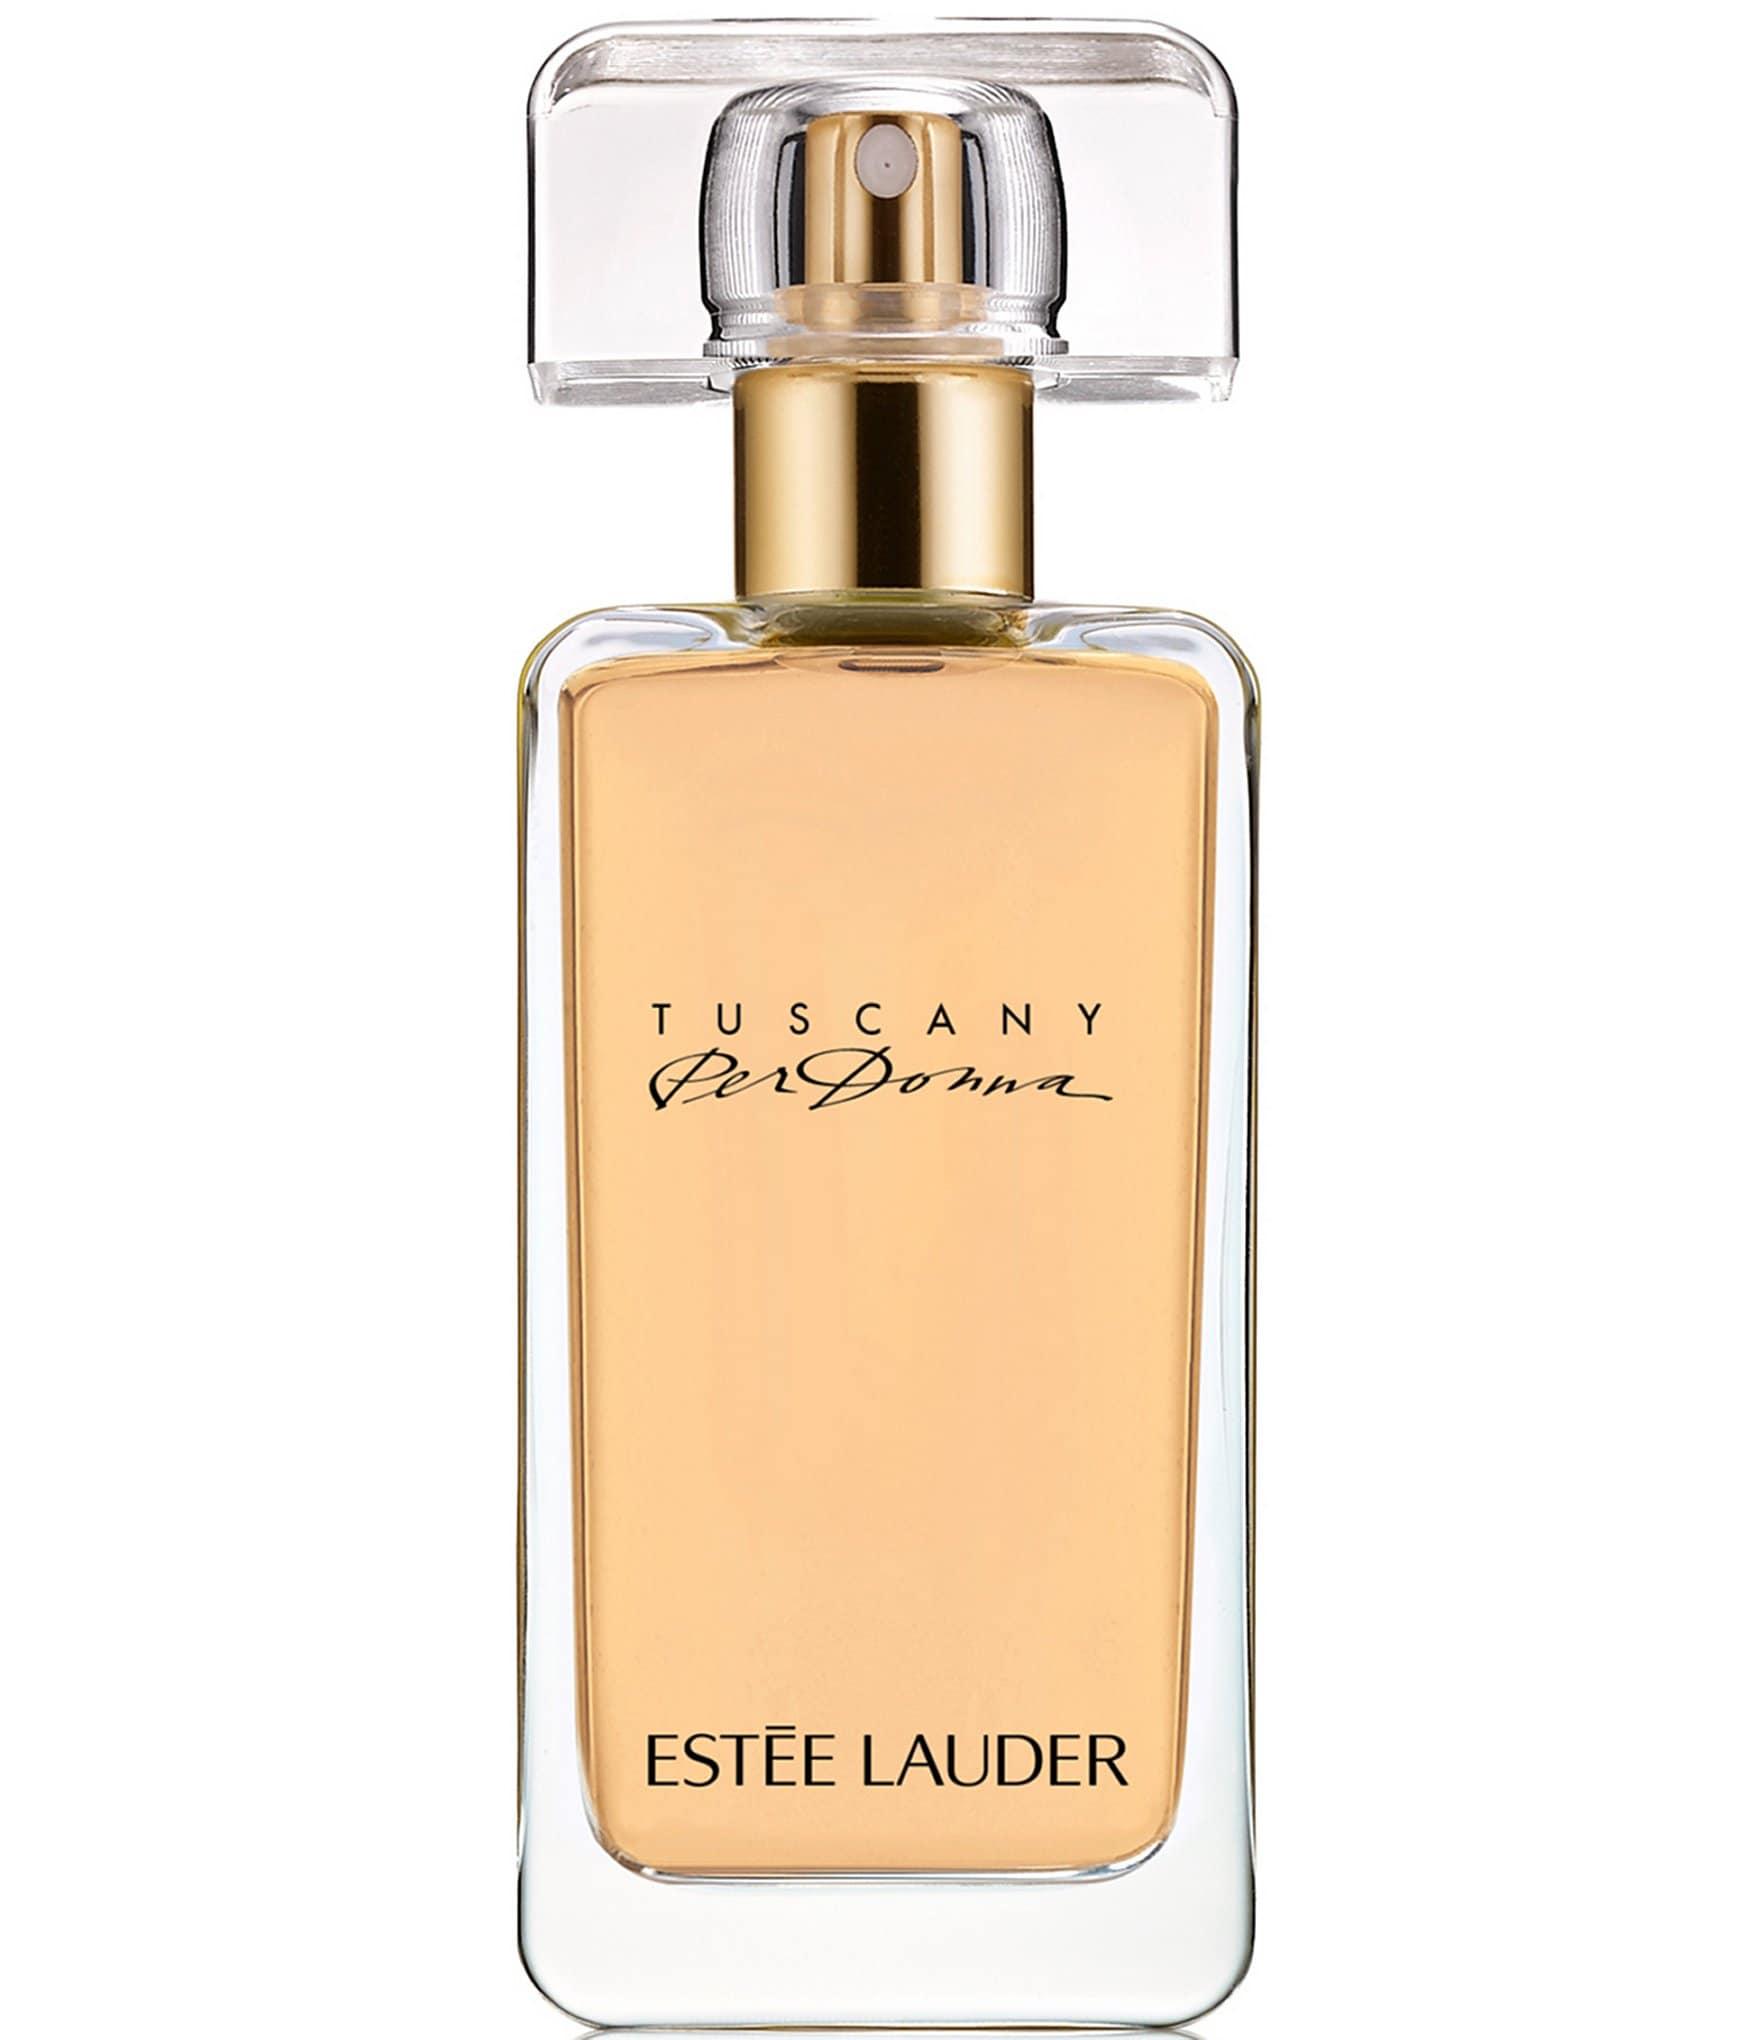 estee lauder tuscany per donna eau de parfum spray dillards. Black Bedroom Furniture Sets. Home Design Ideas